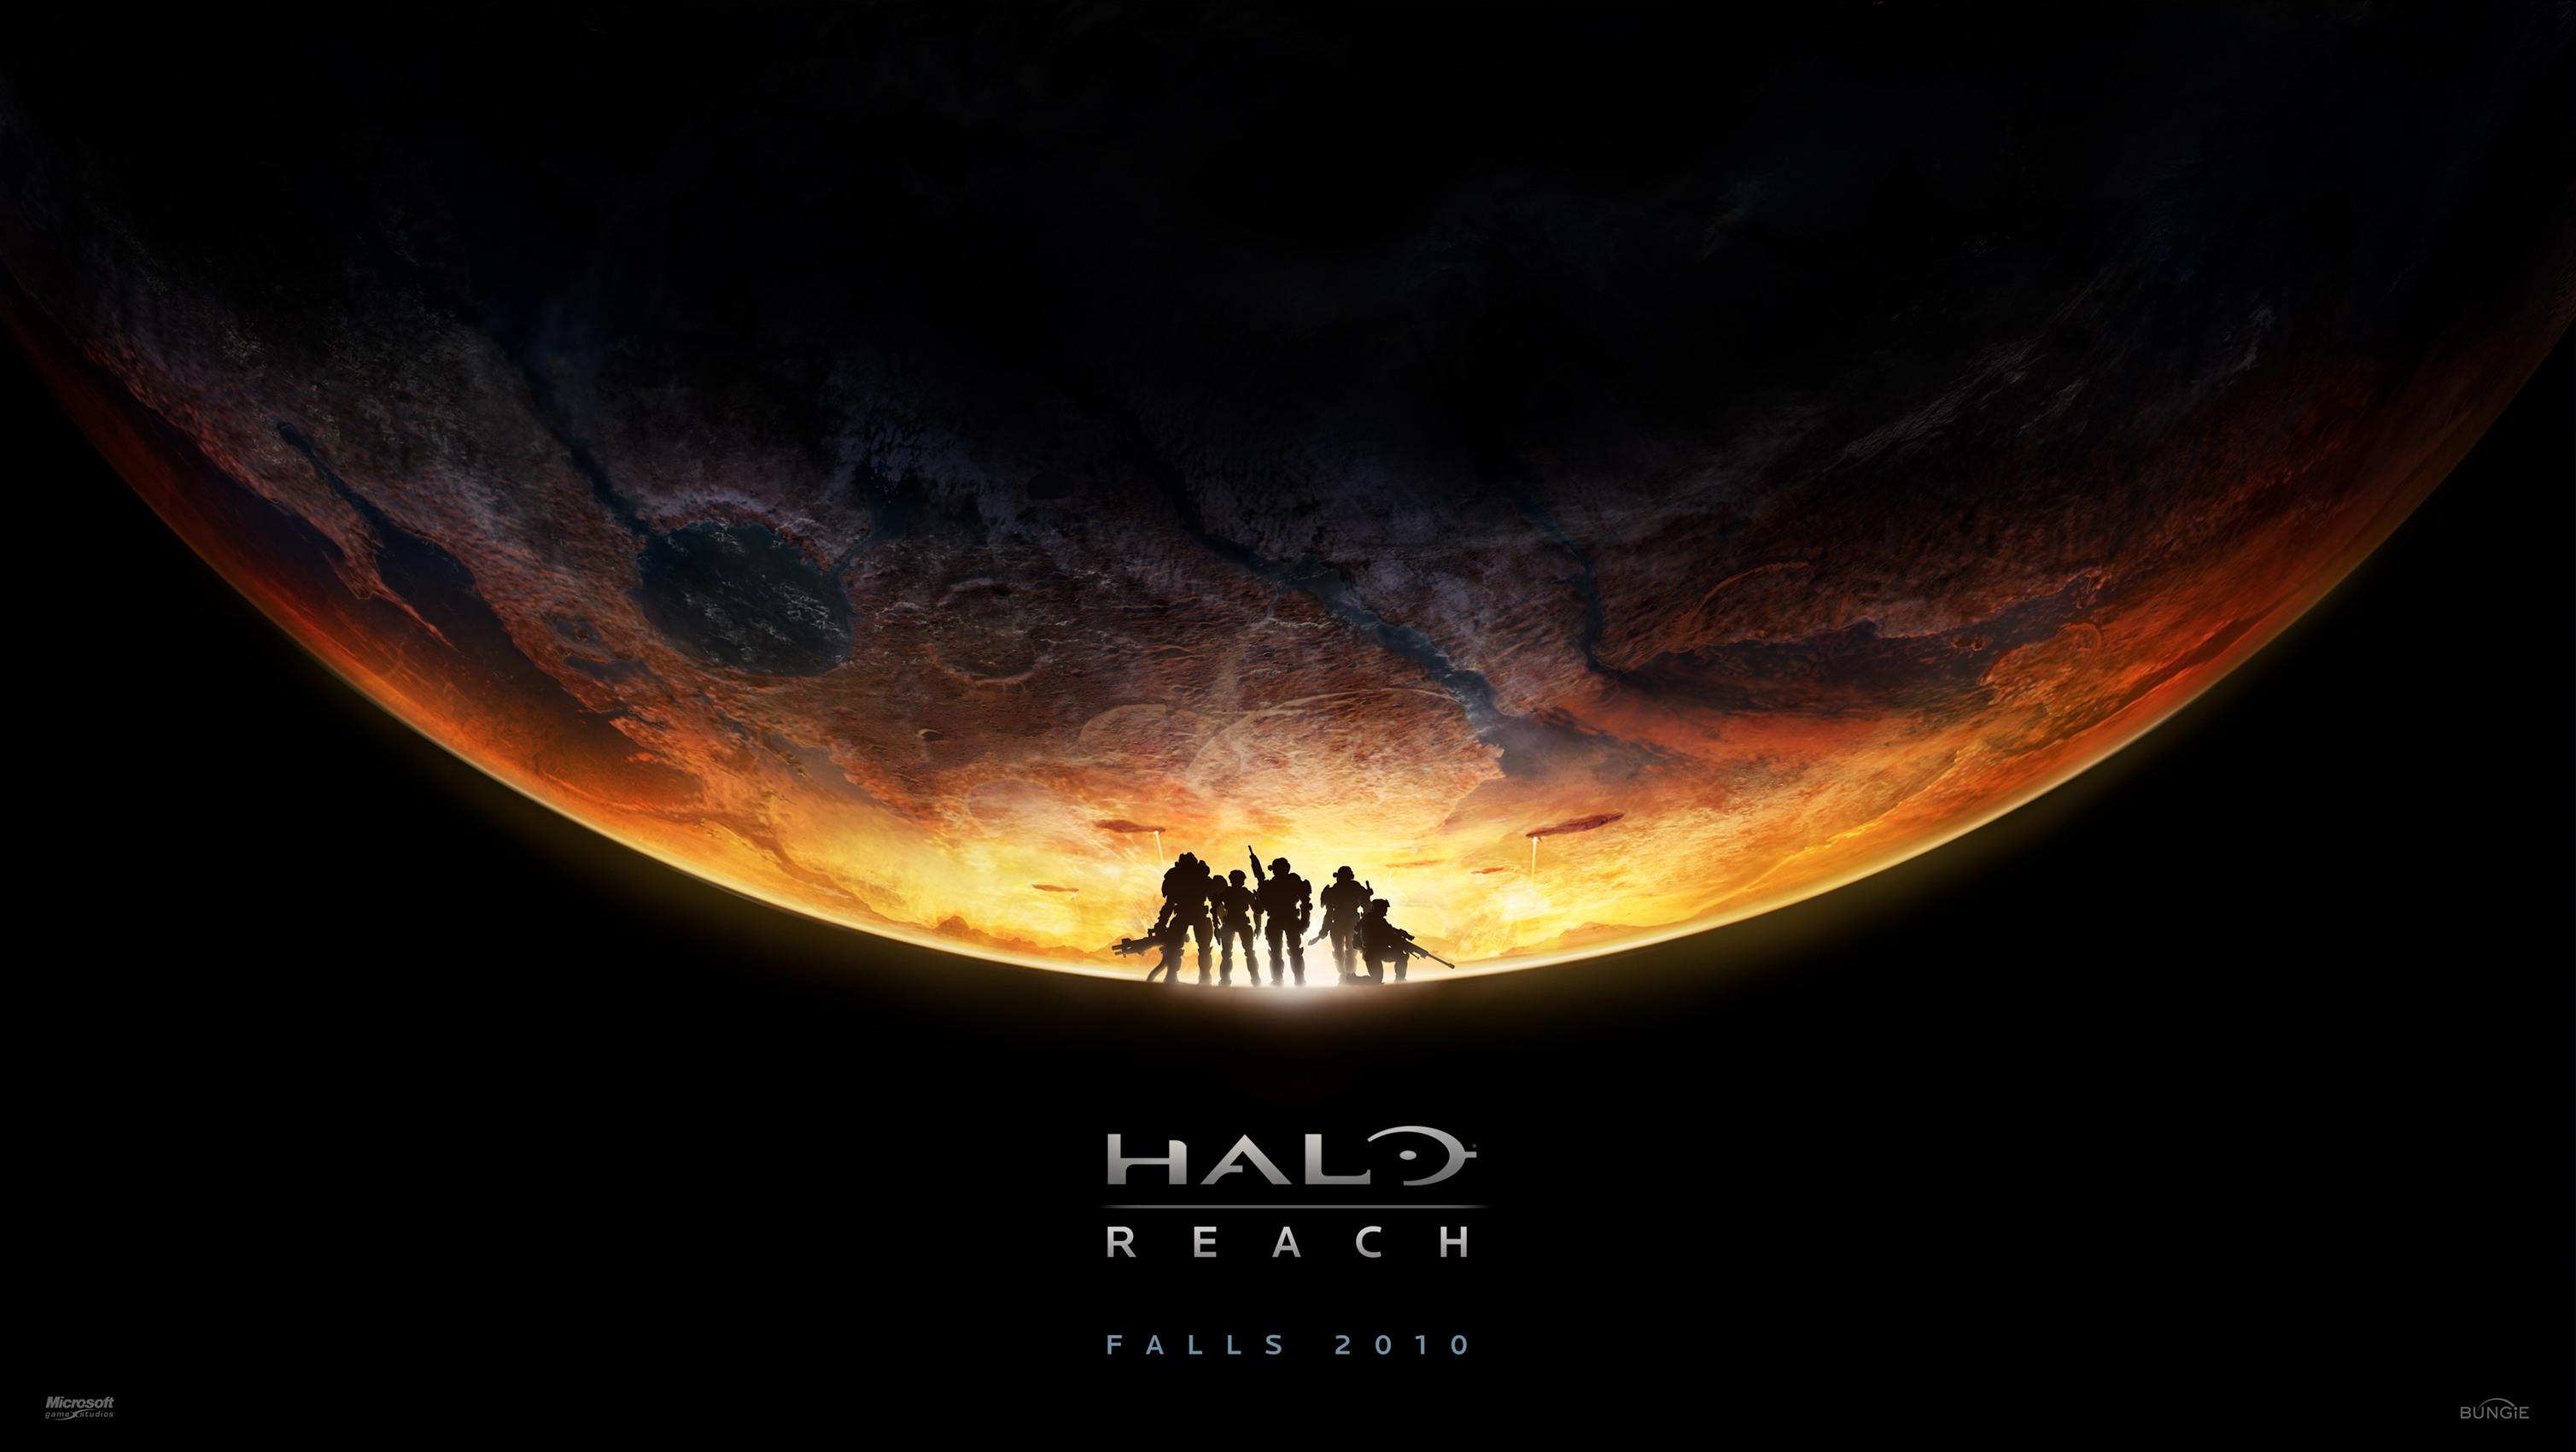 Halo Reach desktop wallpaper 3017x1700